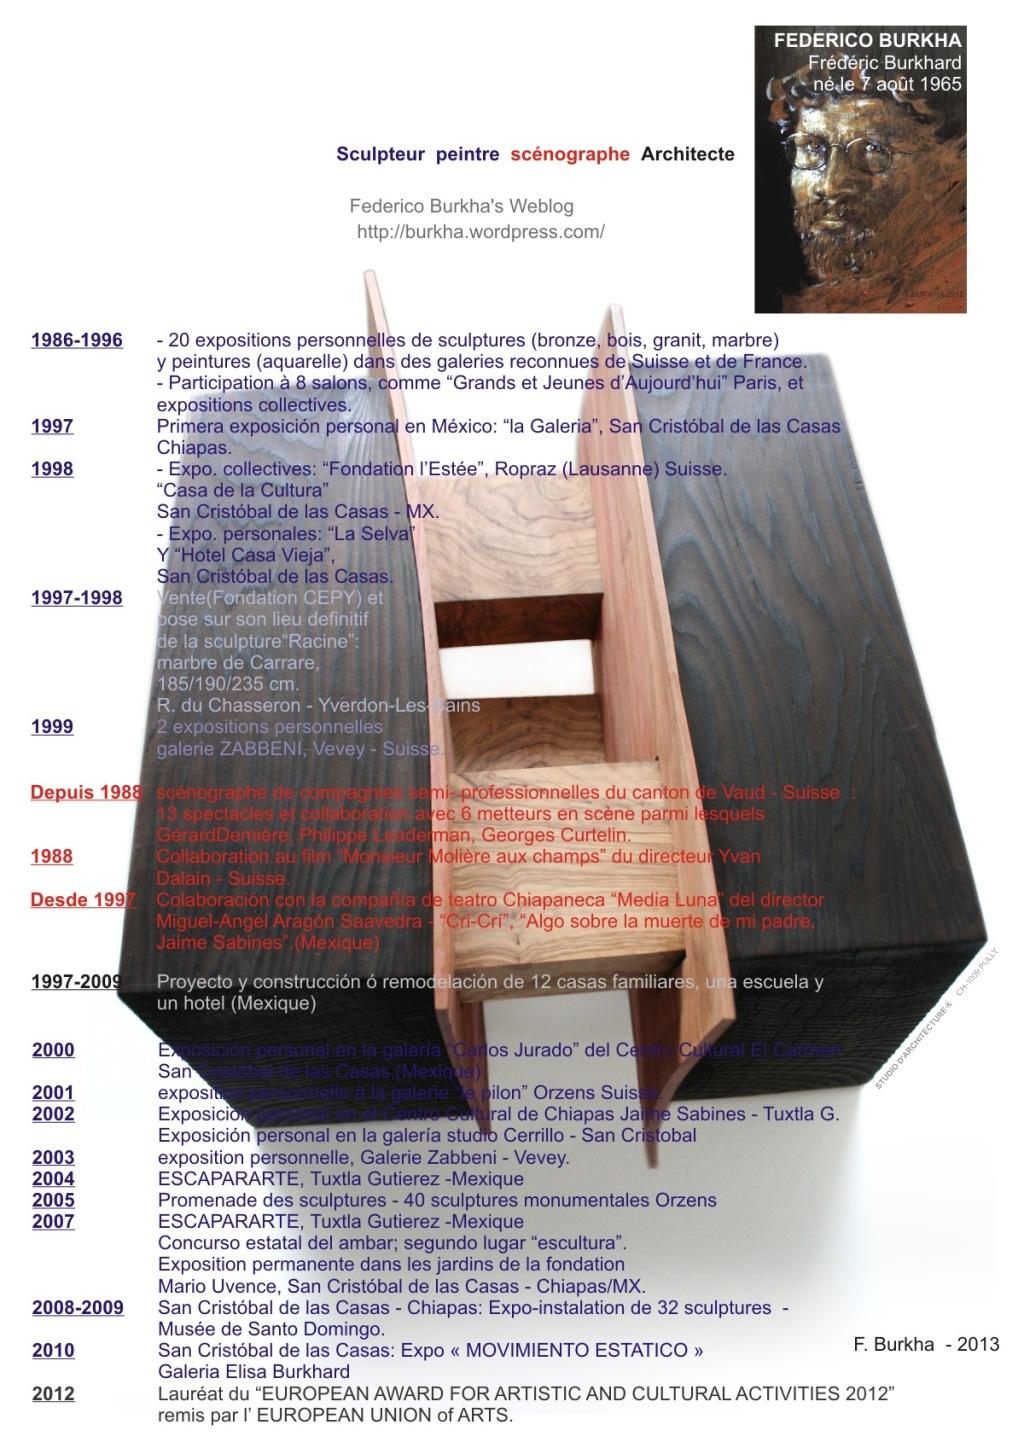 Curriculum Vitae de Frédéric Burkhard dit Federico Burkha